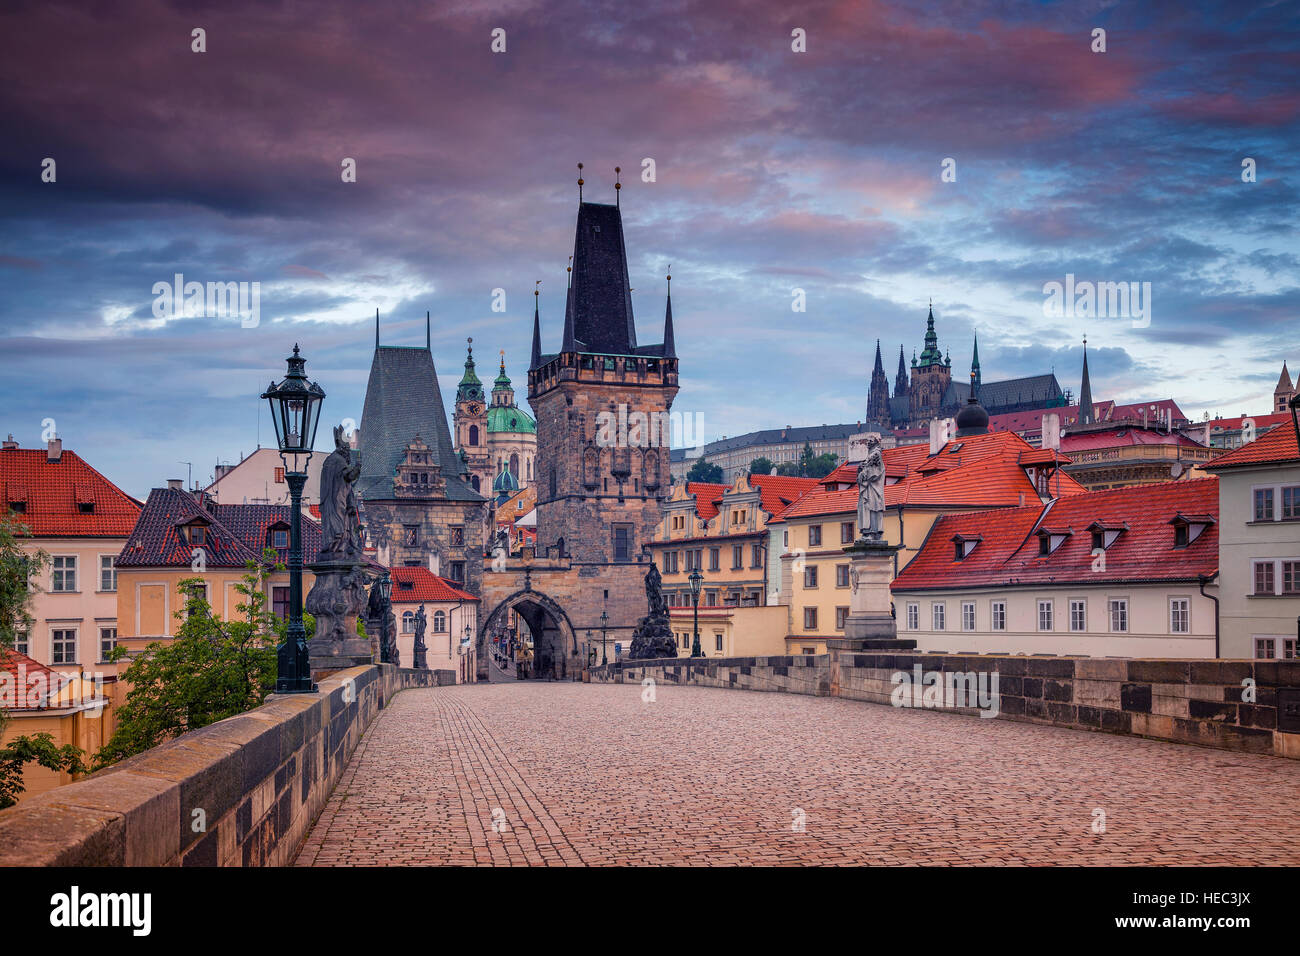 Karlsbrücke, Prag. Stadtbild Bild der Karlsbrücke in Prag, Tschechien bei Sonnenaufgang. Stockbild